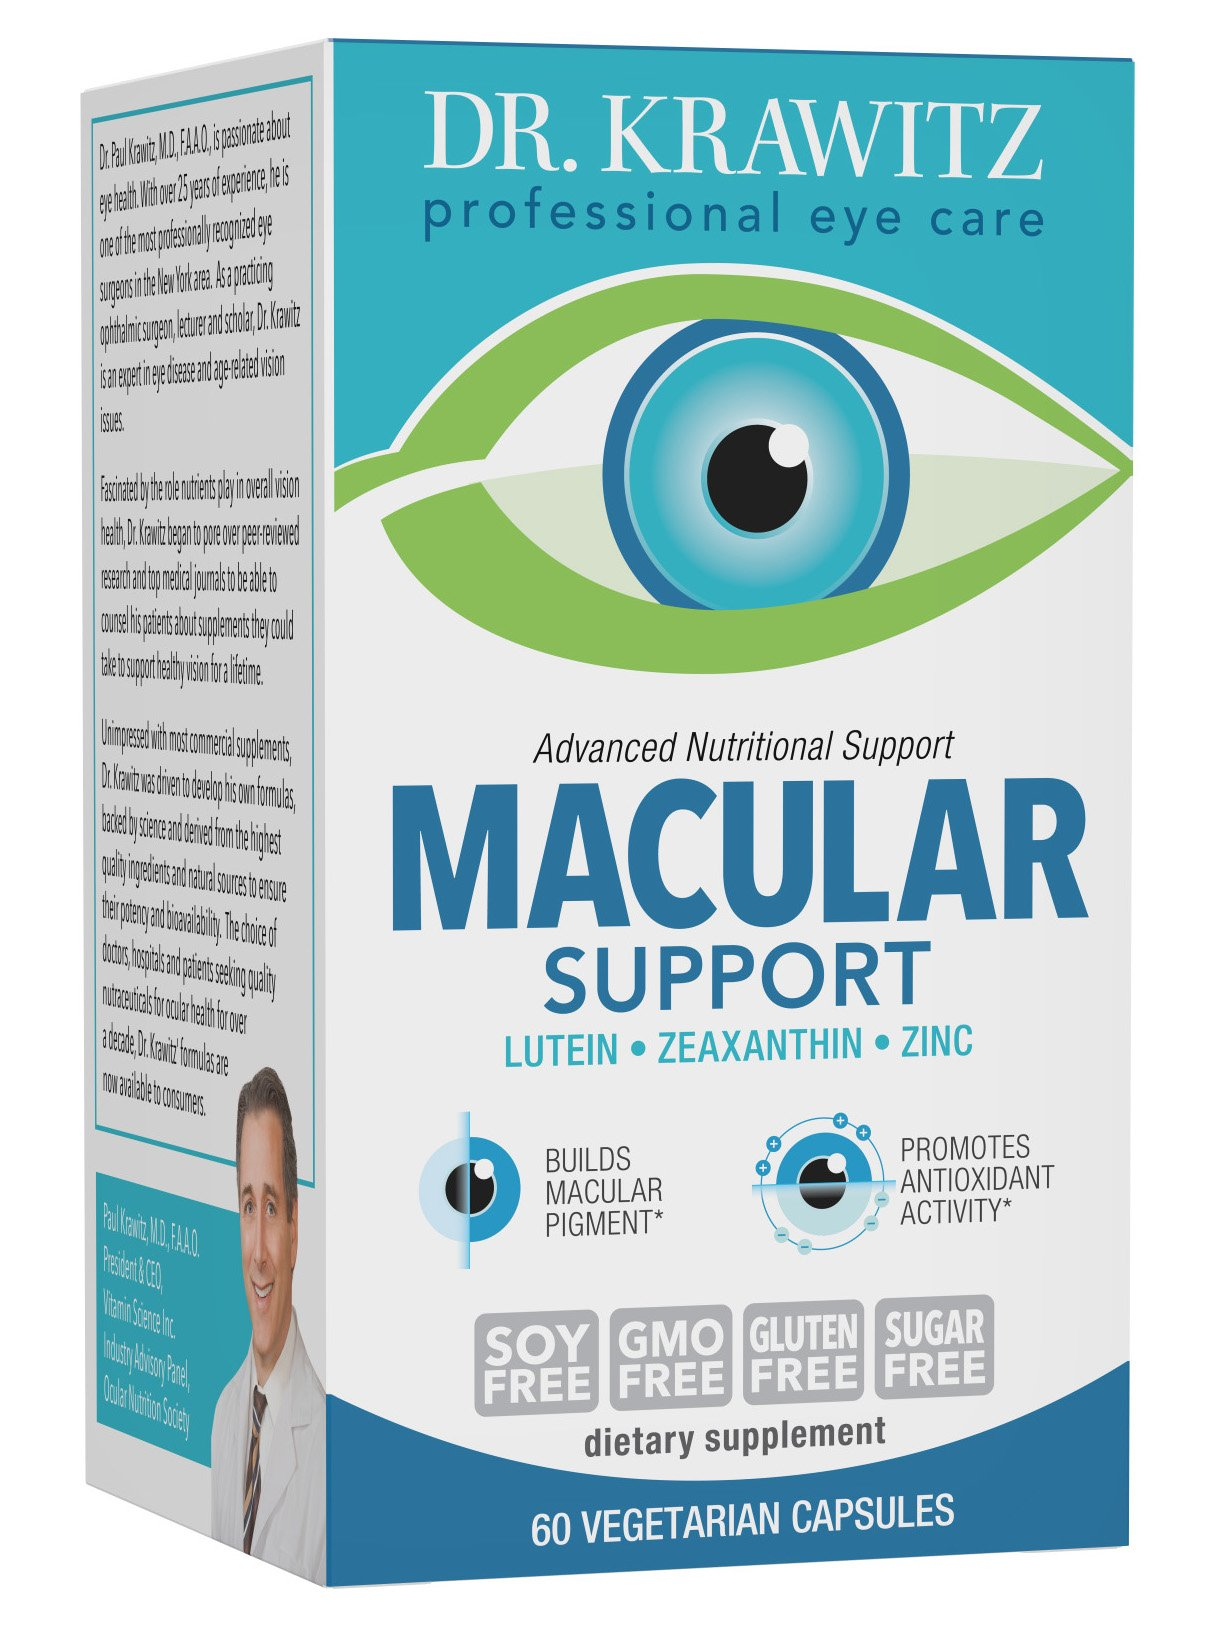 Dr. Krawitz AREDS 2 Macular Support Eye Vitamins - 60 veg caps